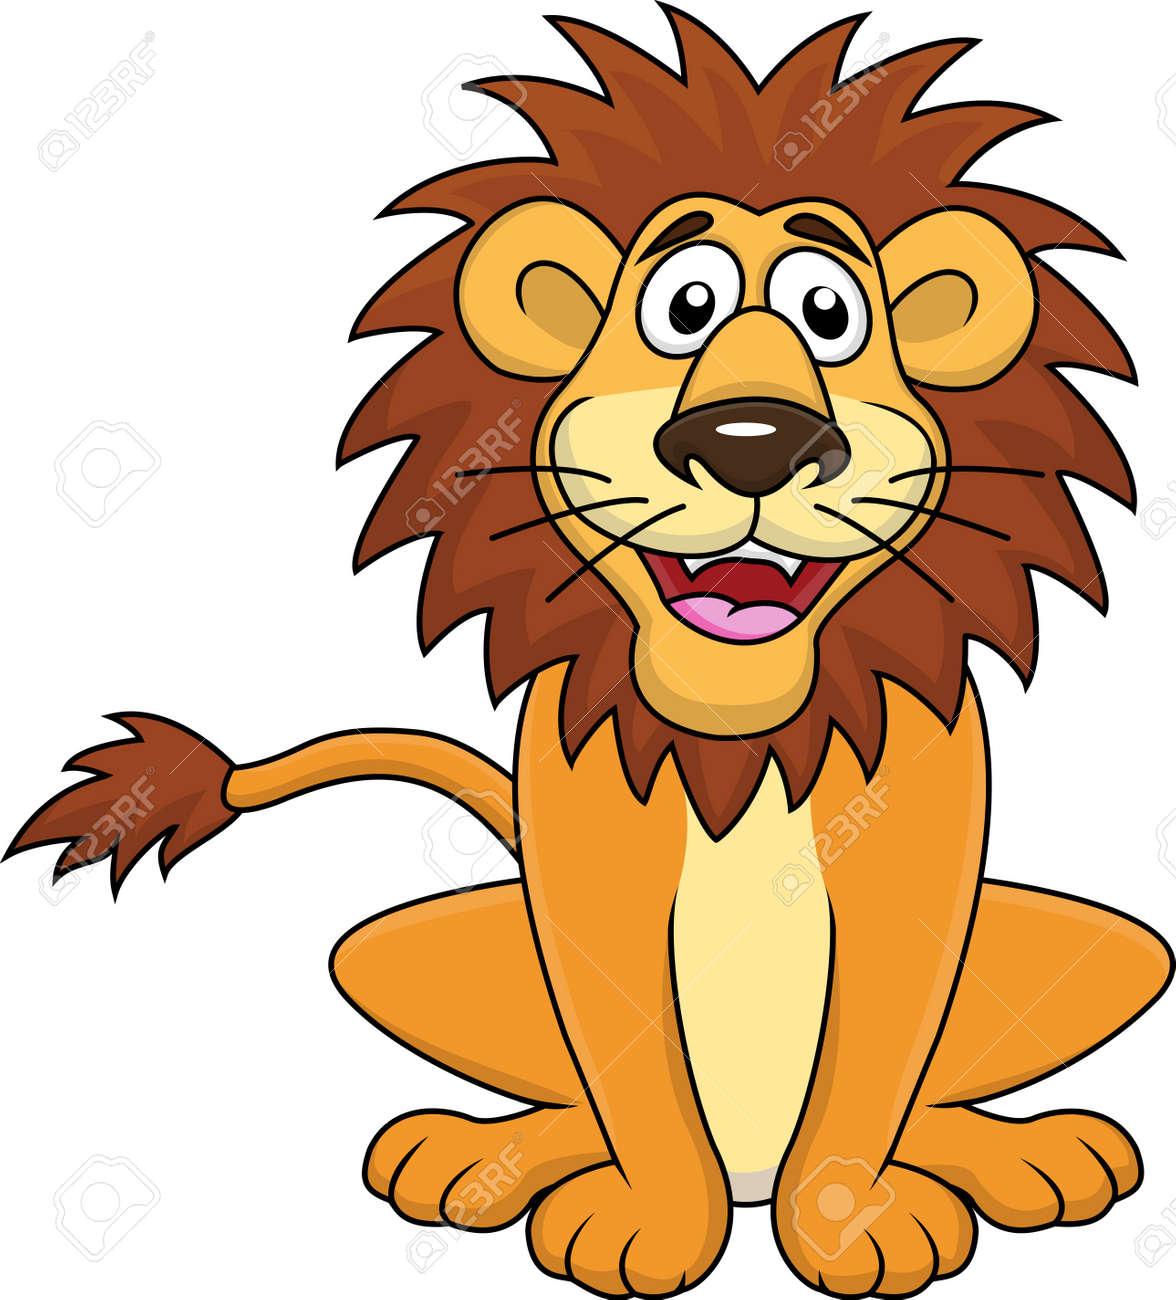 Funny lion cartoon sitting - 14662165